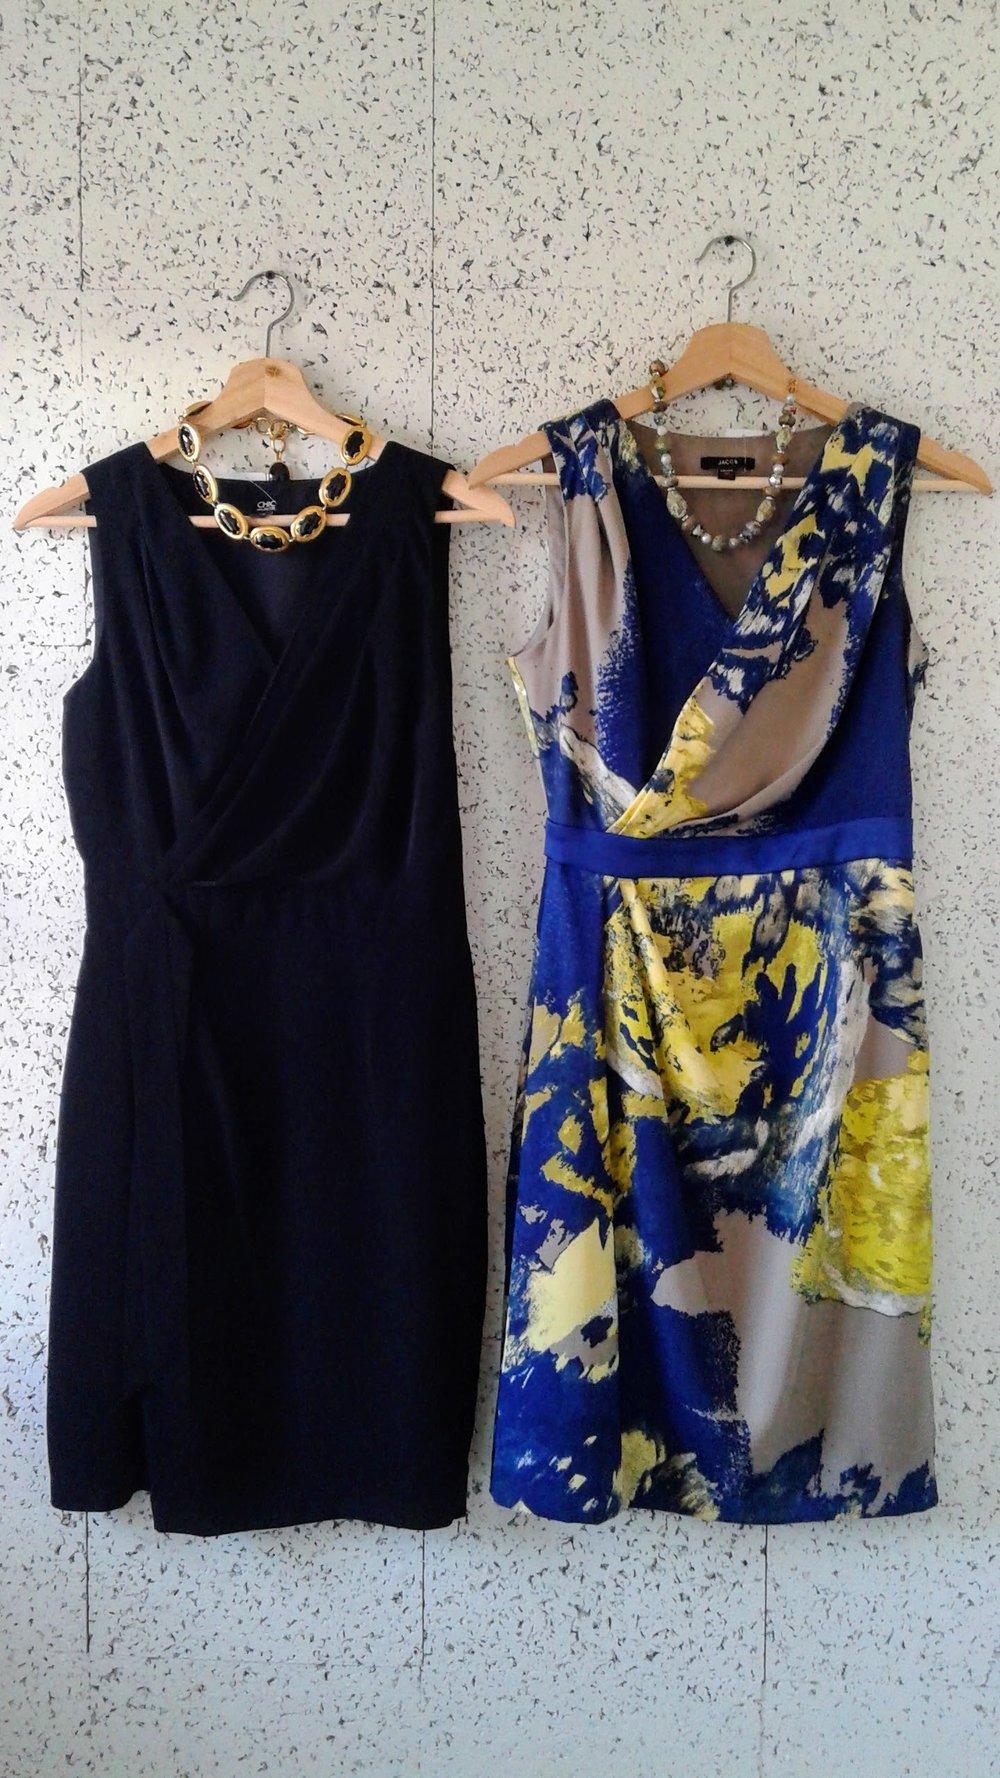 Black Jacob dress; Size S, $28. Blue Jacob dress; Size XS, $32